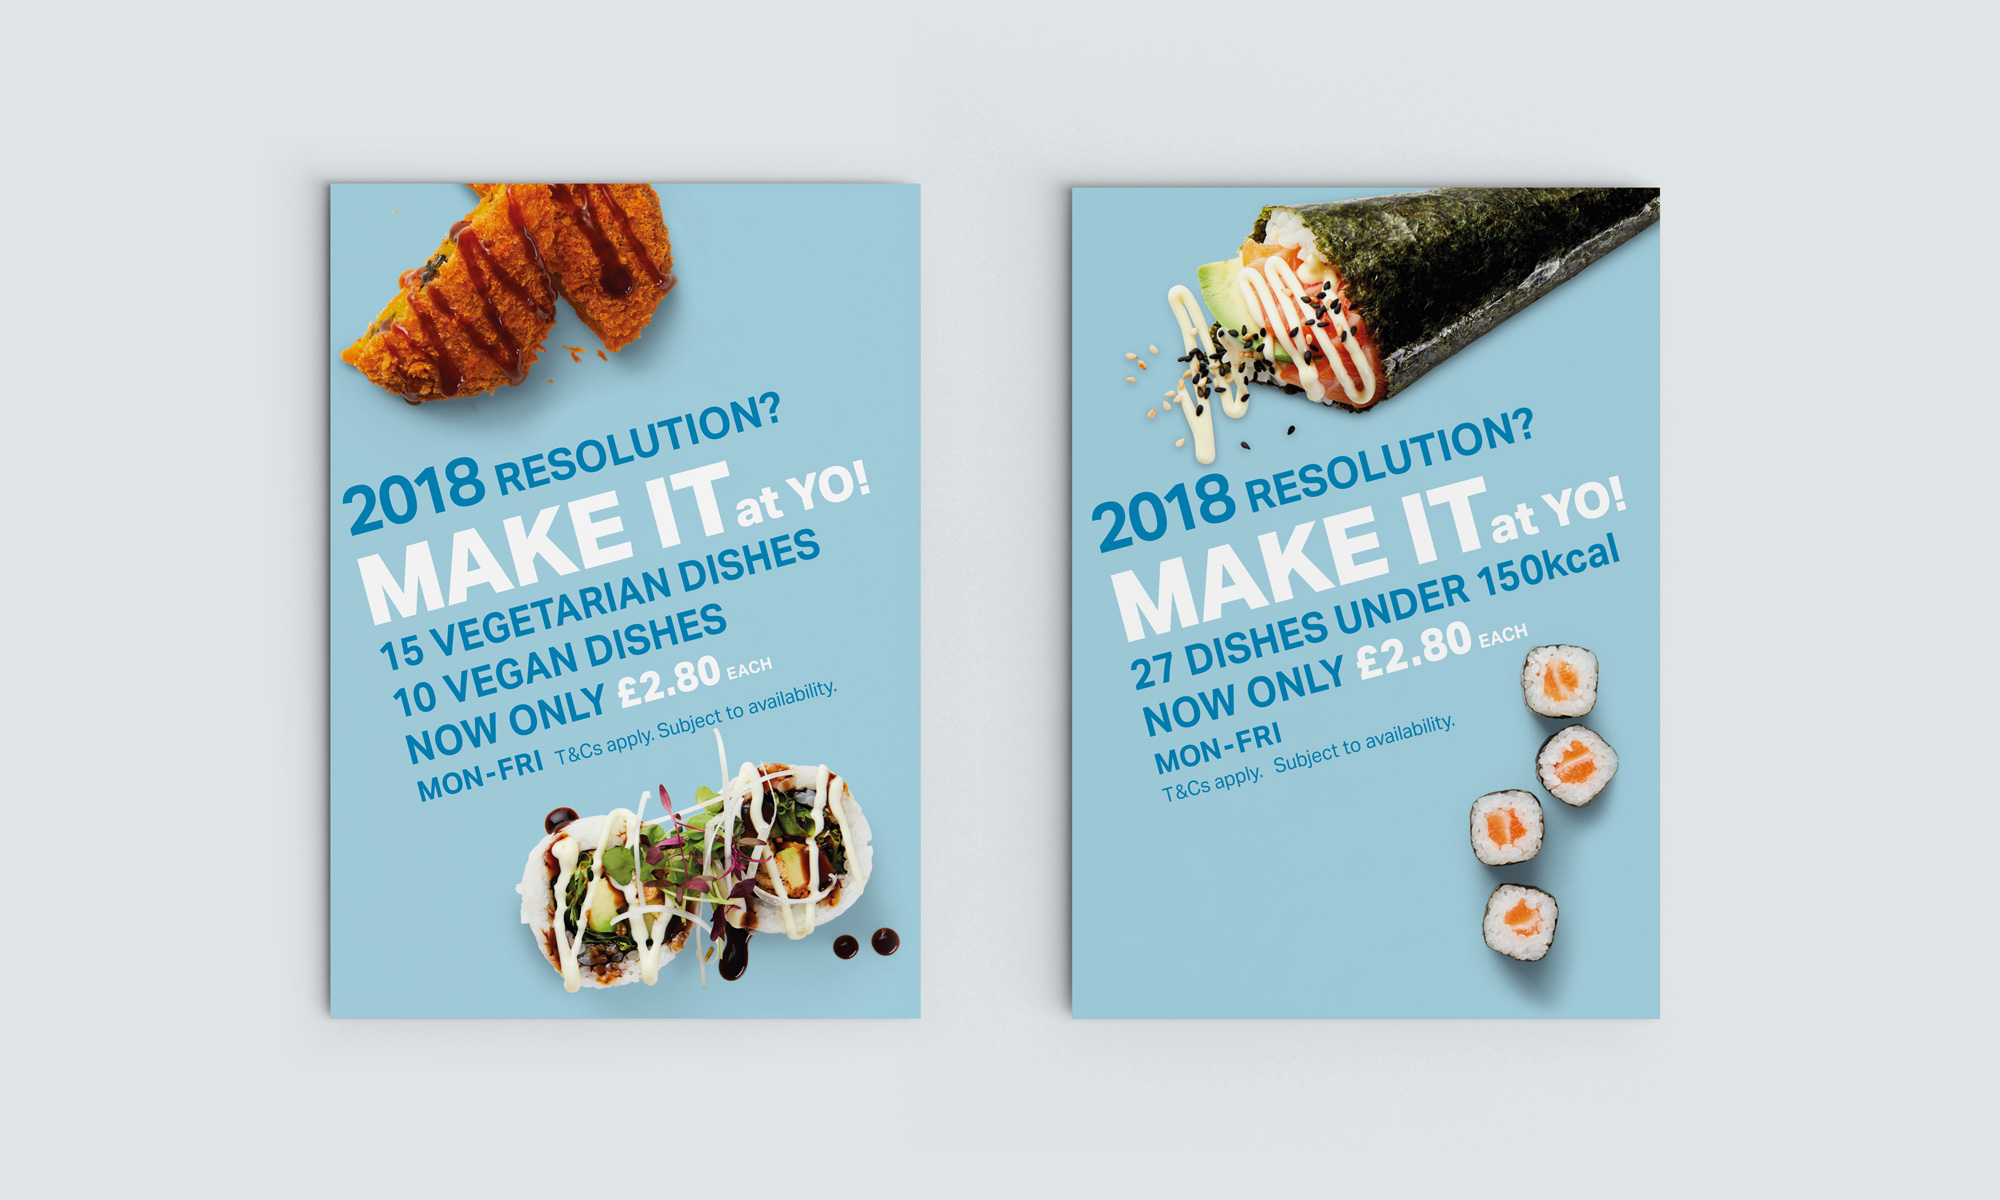 Postcard size POS displays the campaign creative on the conveyor belt.